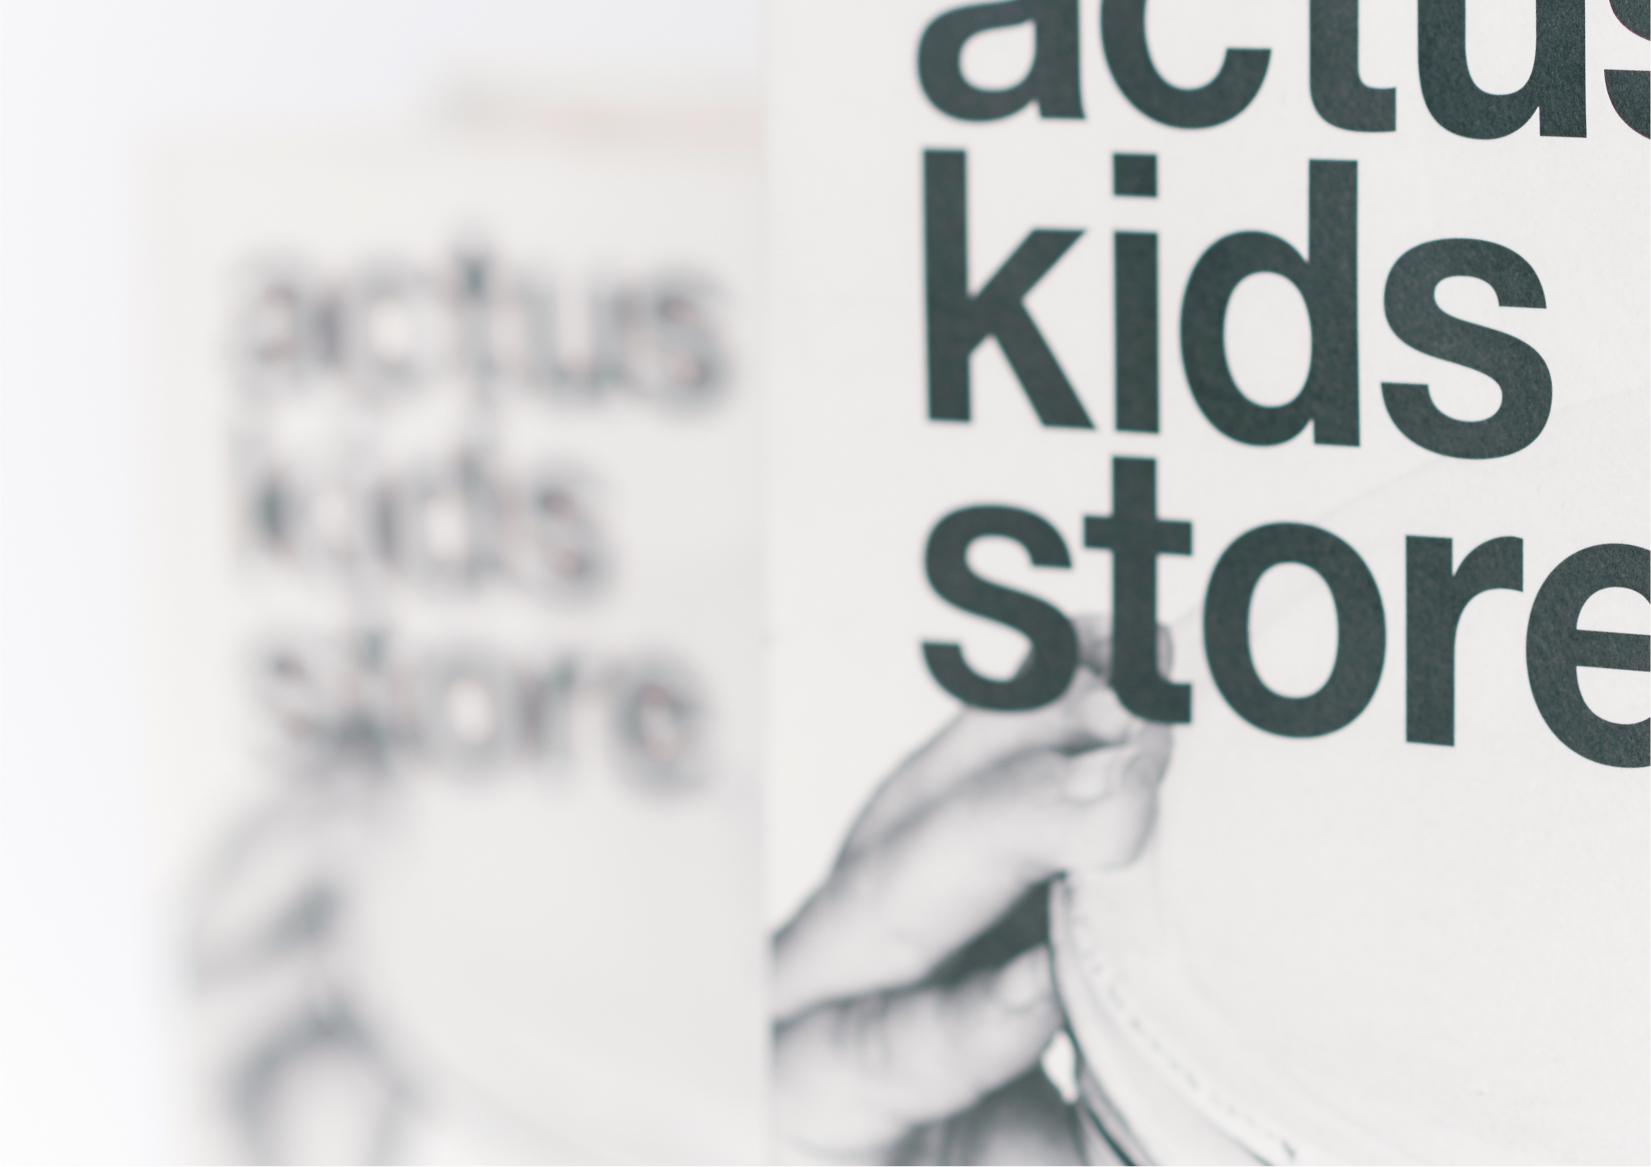 ACTUS KIDS STOREのイメージ